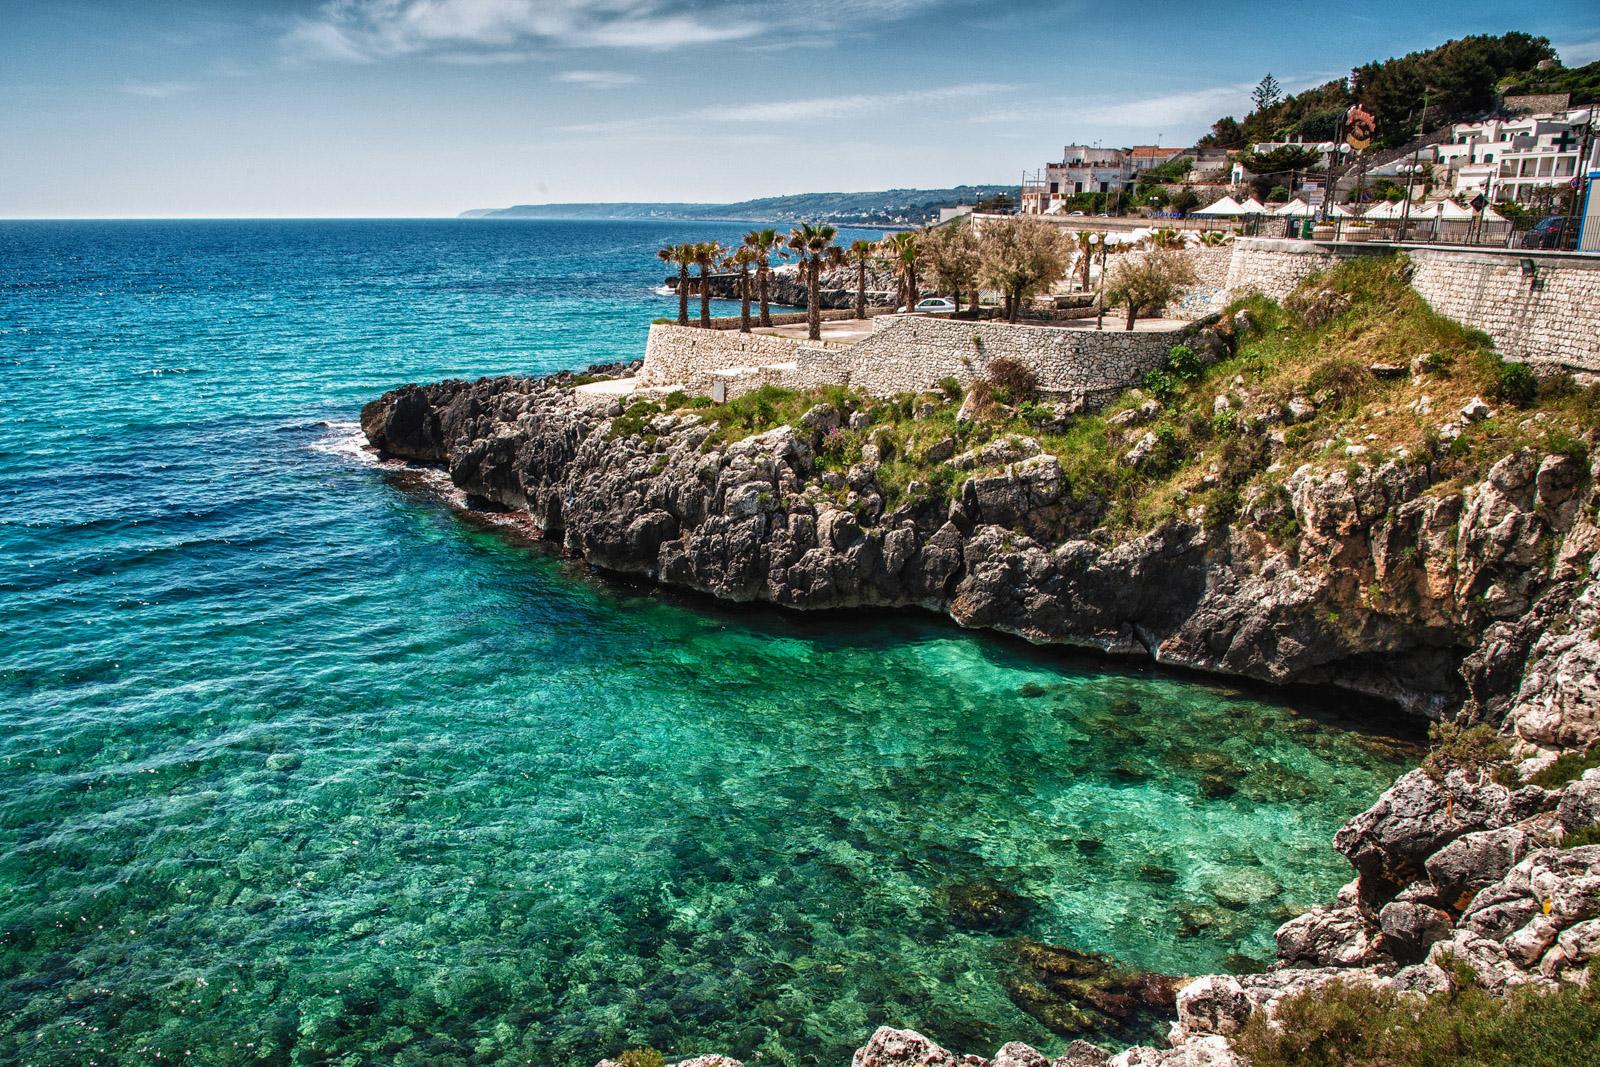 Castro Marina, Puglia, southern Italy